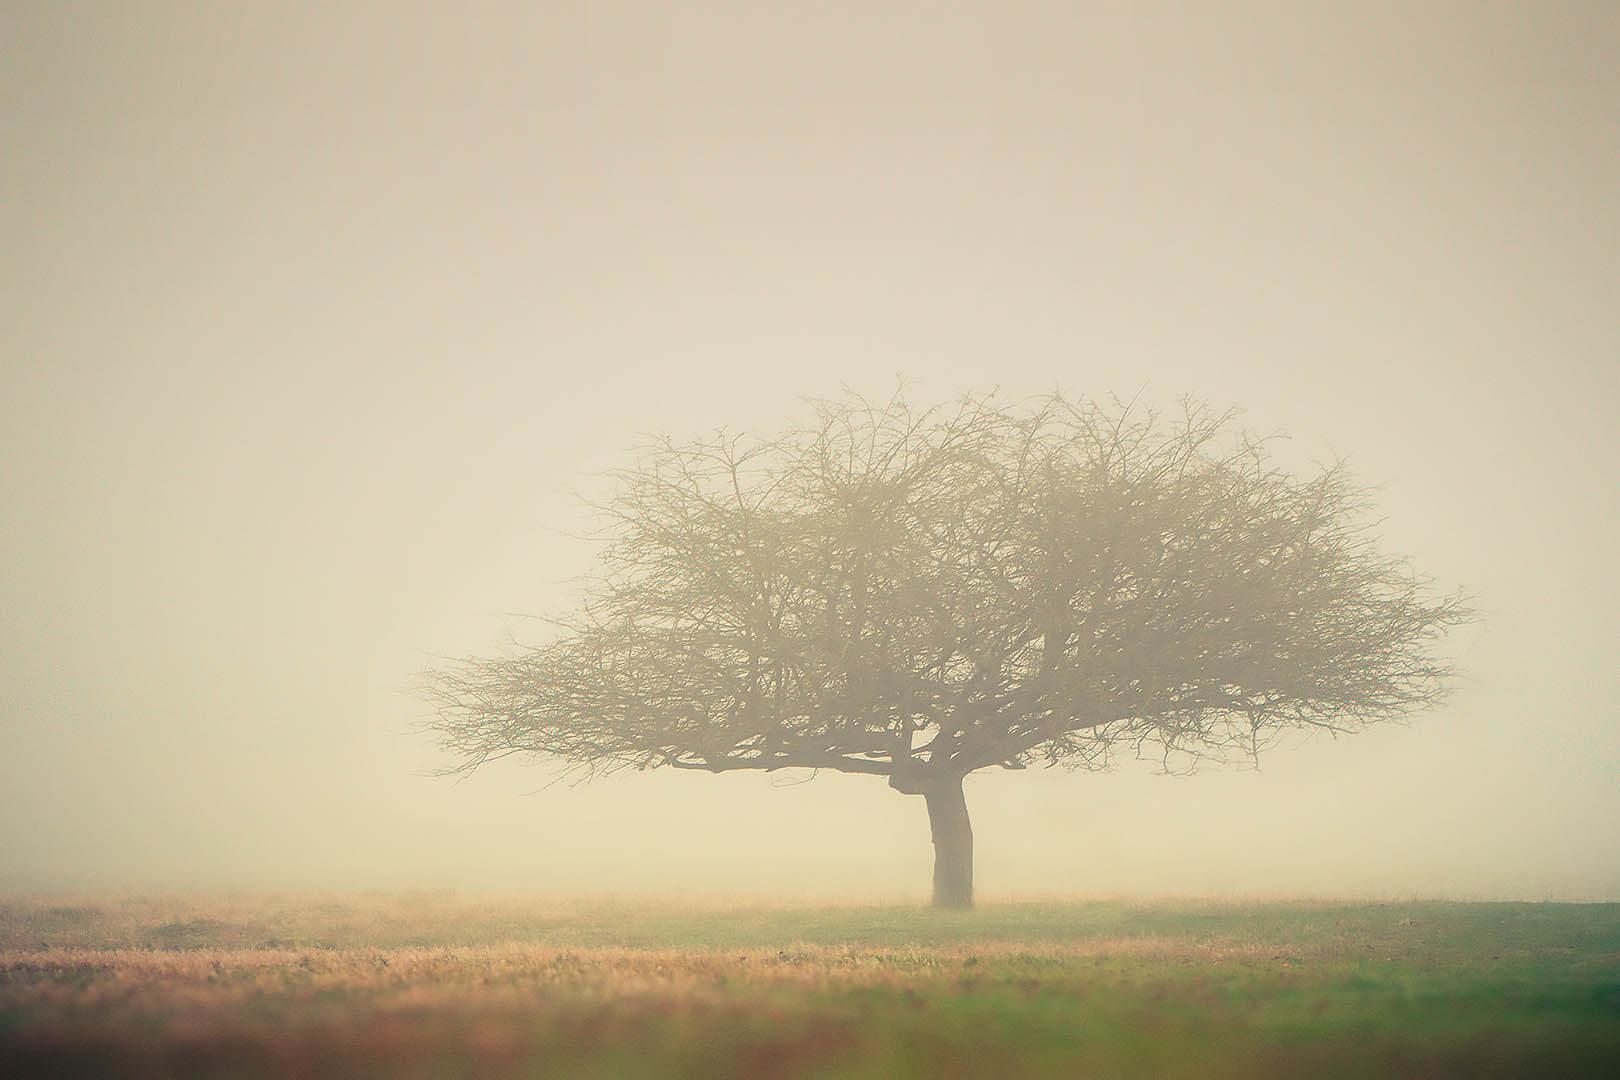 Tree In Fog #1